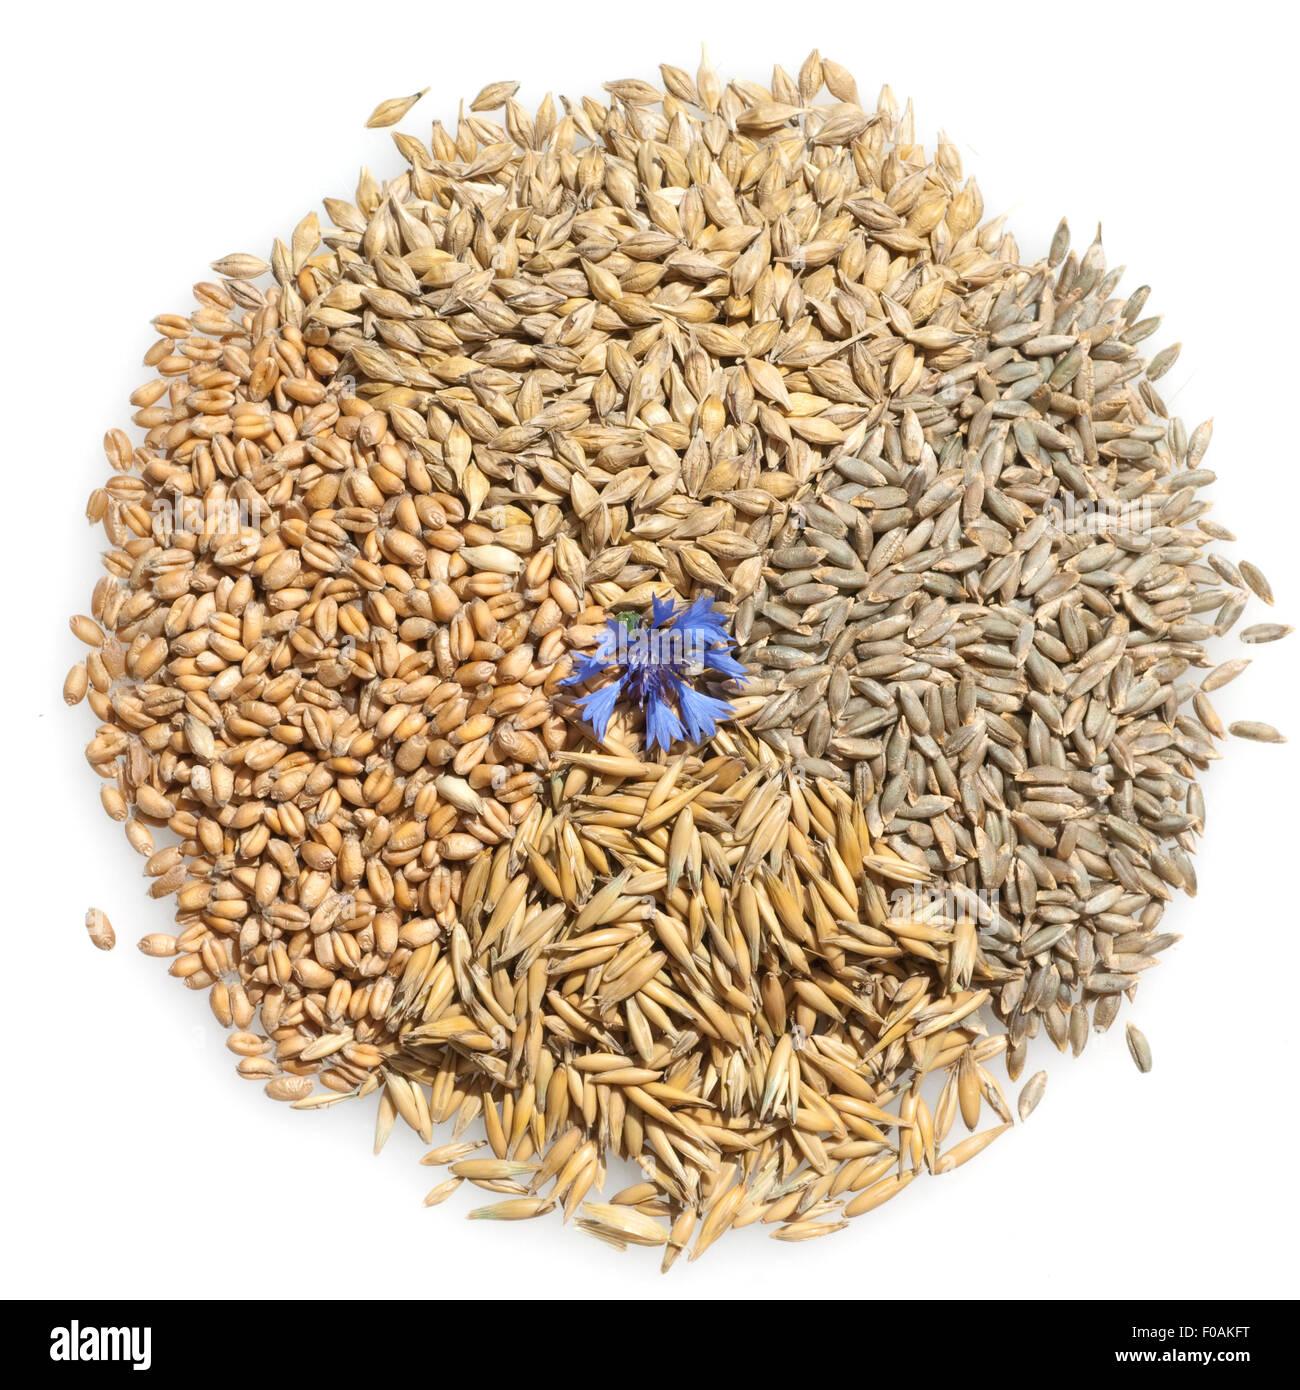 Getreidesorten, Getreide, Getreidekoerner; Stock Photo